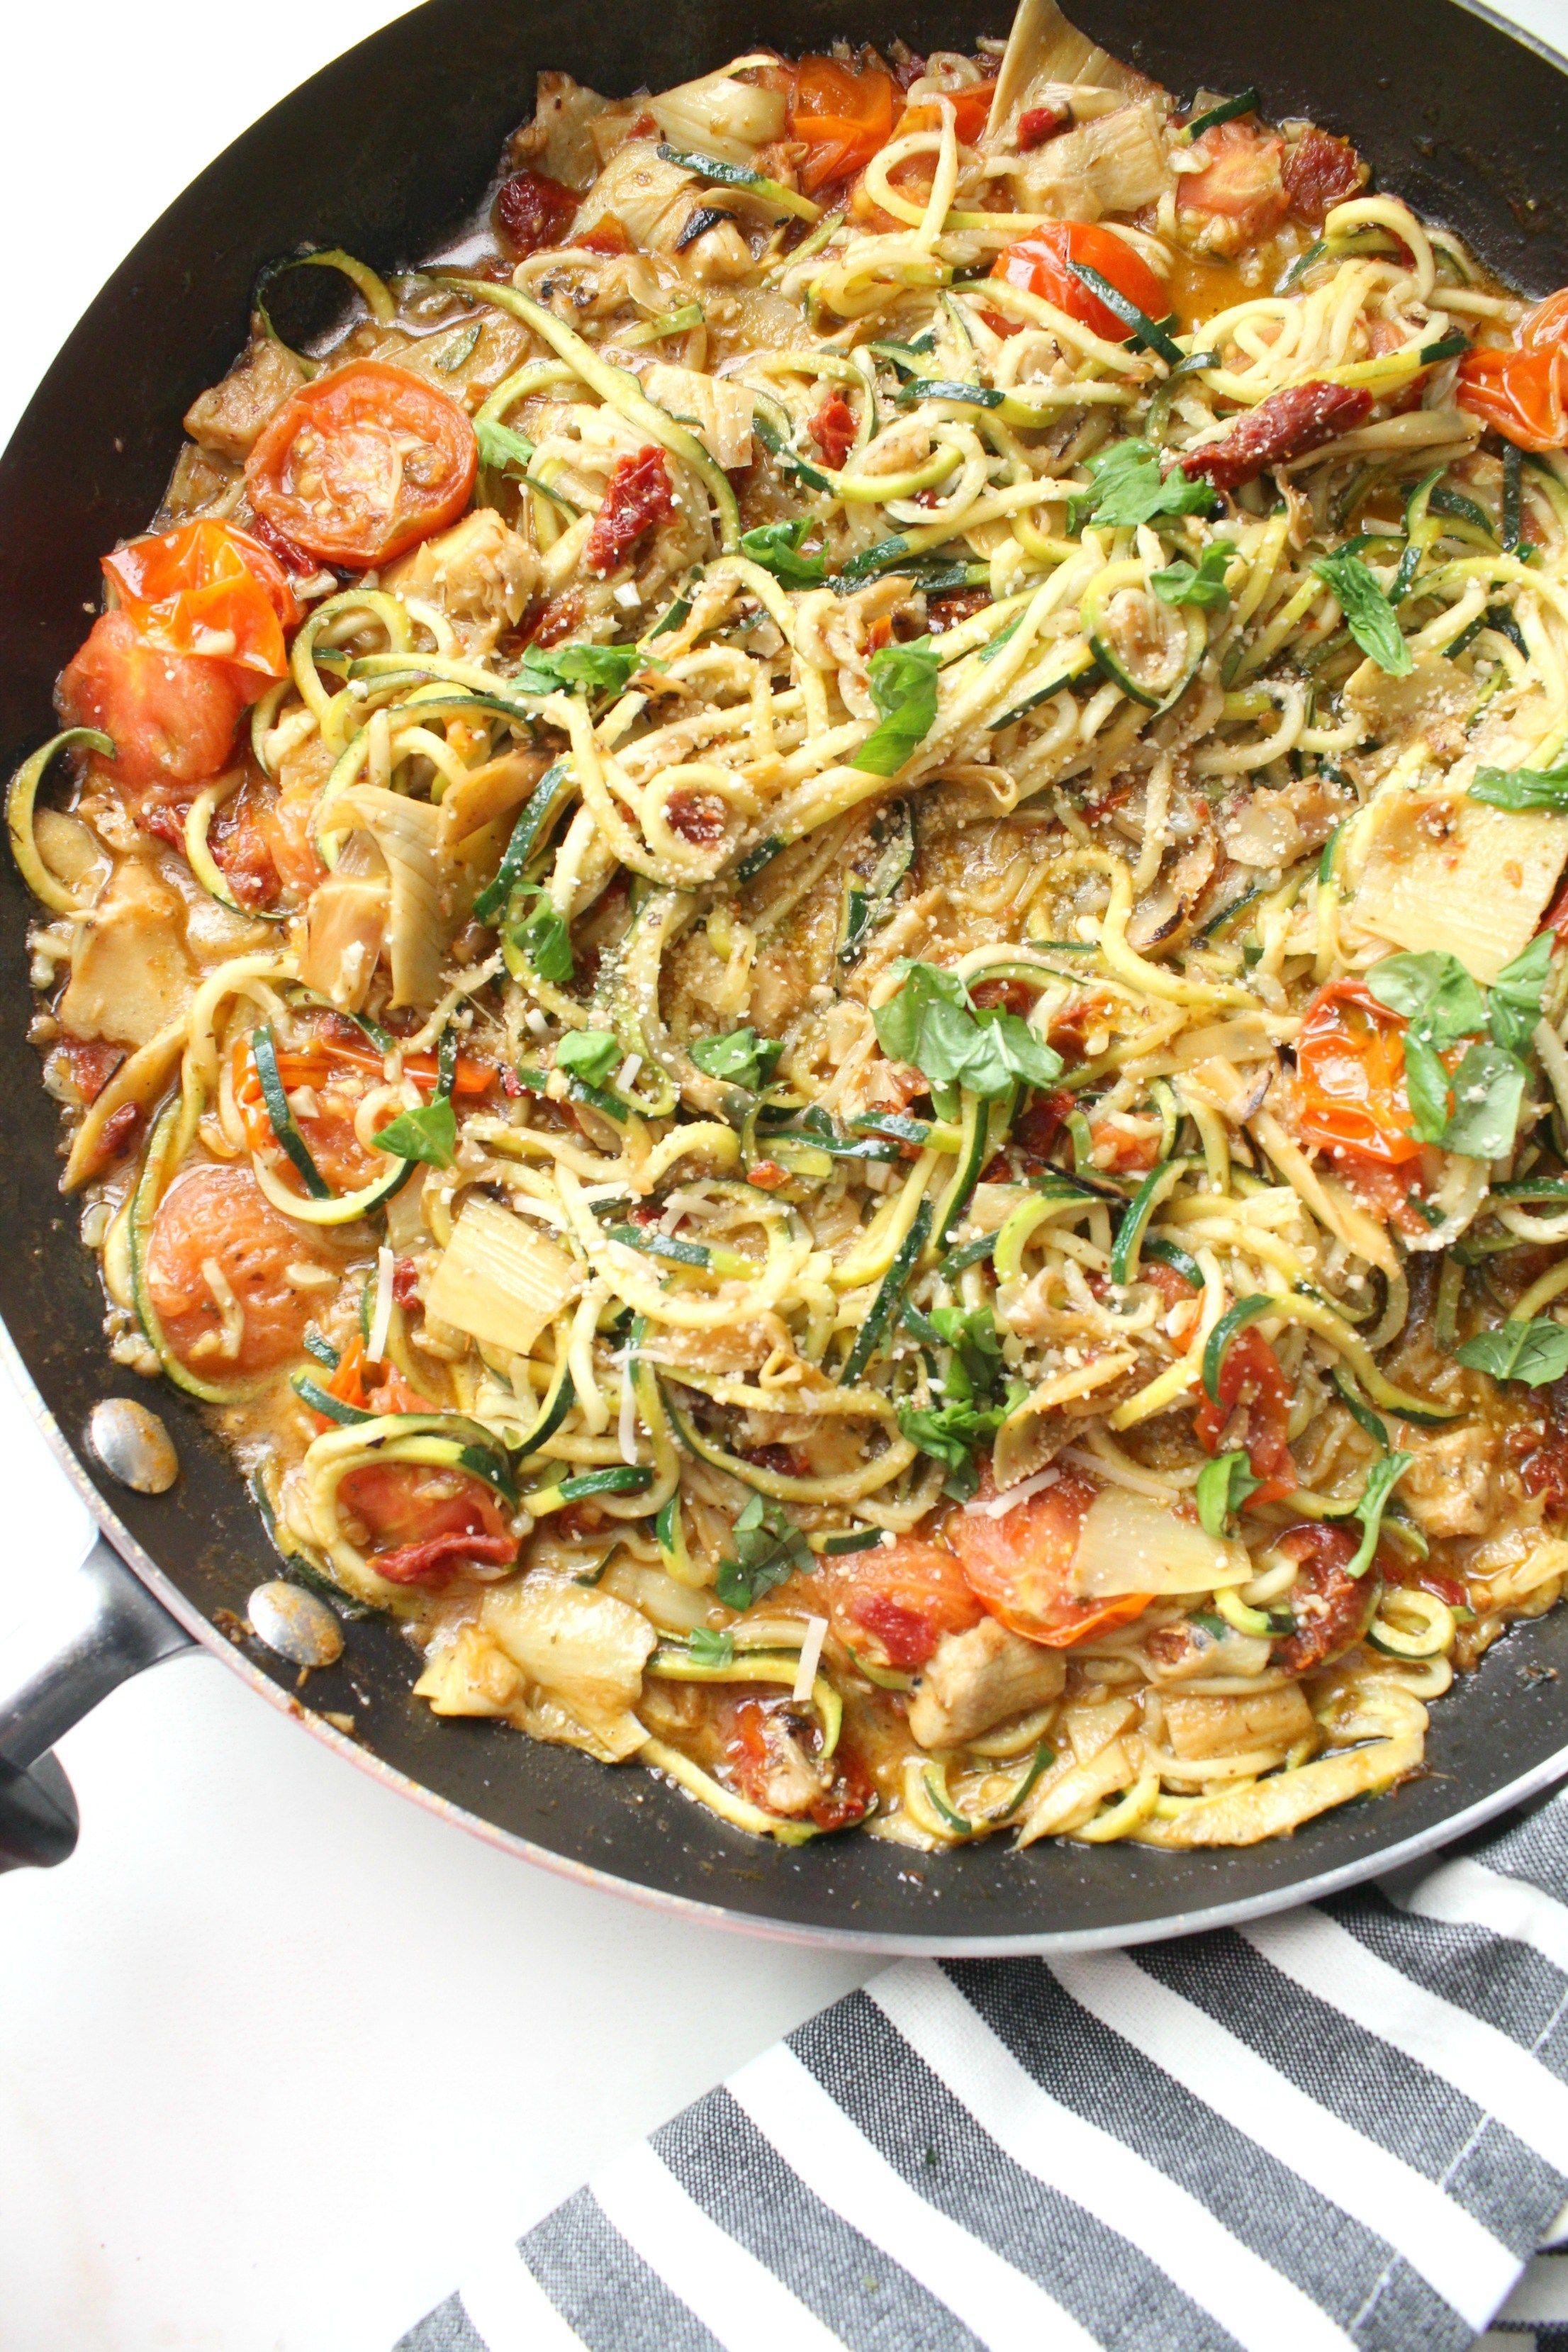 Mediterranean Zucchini Noodles This Savory Vegan Recipe Vegan Zoodle Recipes Vegan Zucchini Recipes Savory Vegan